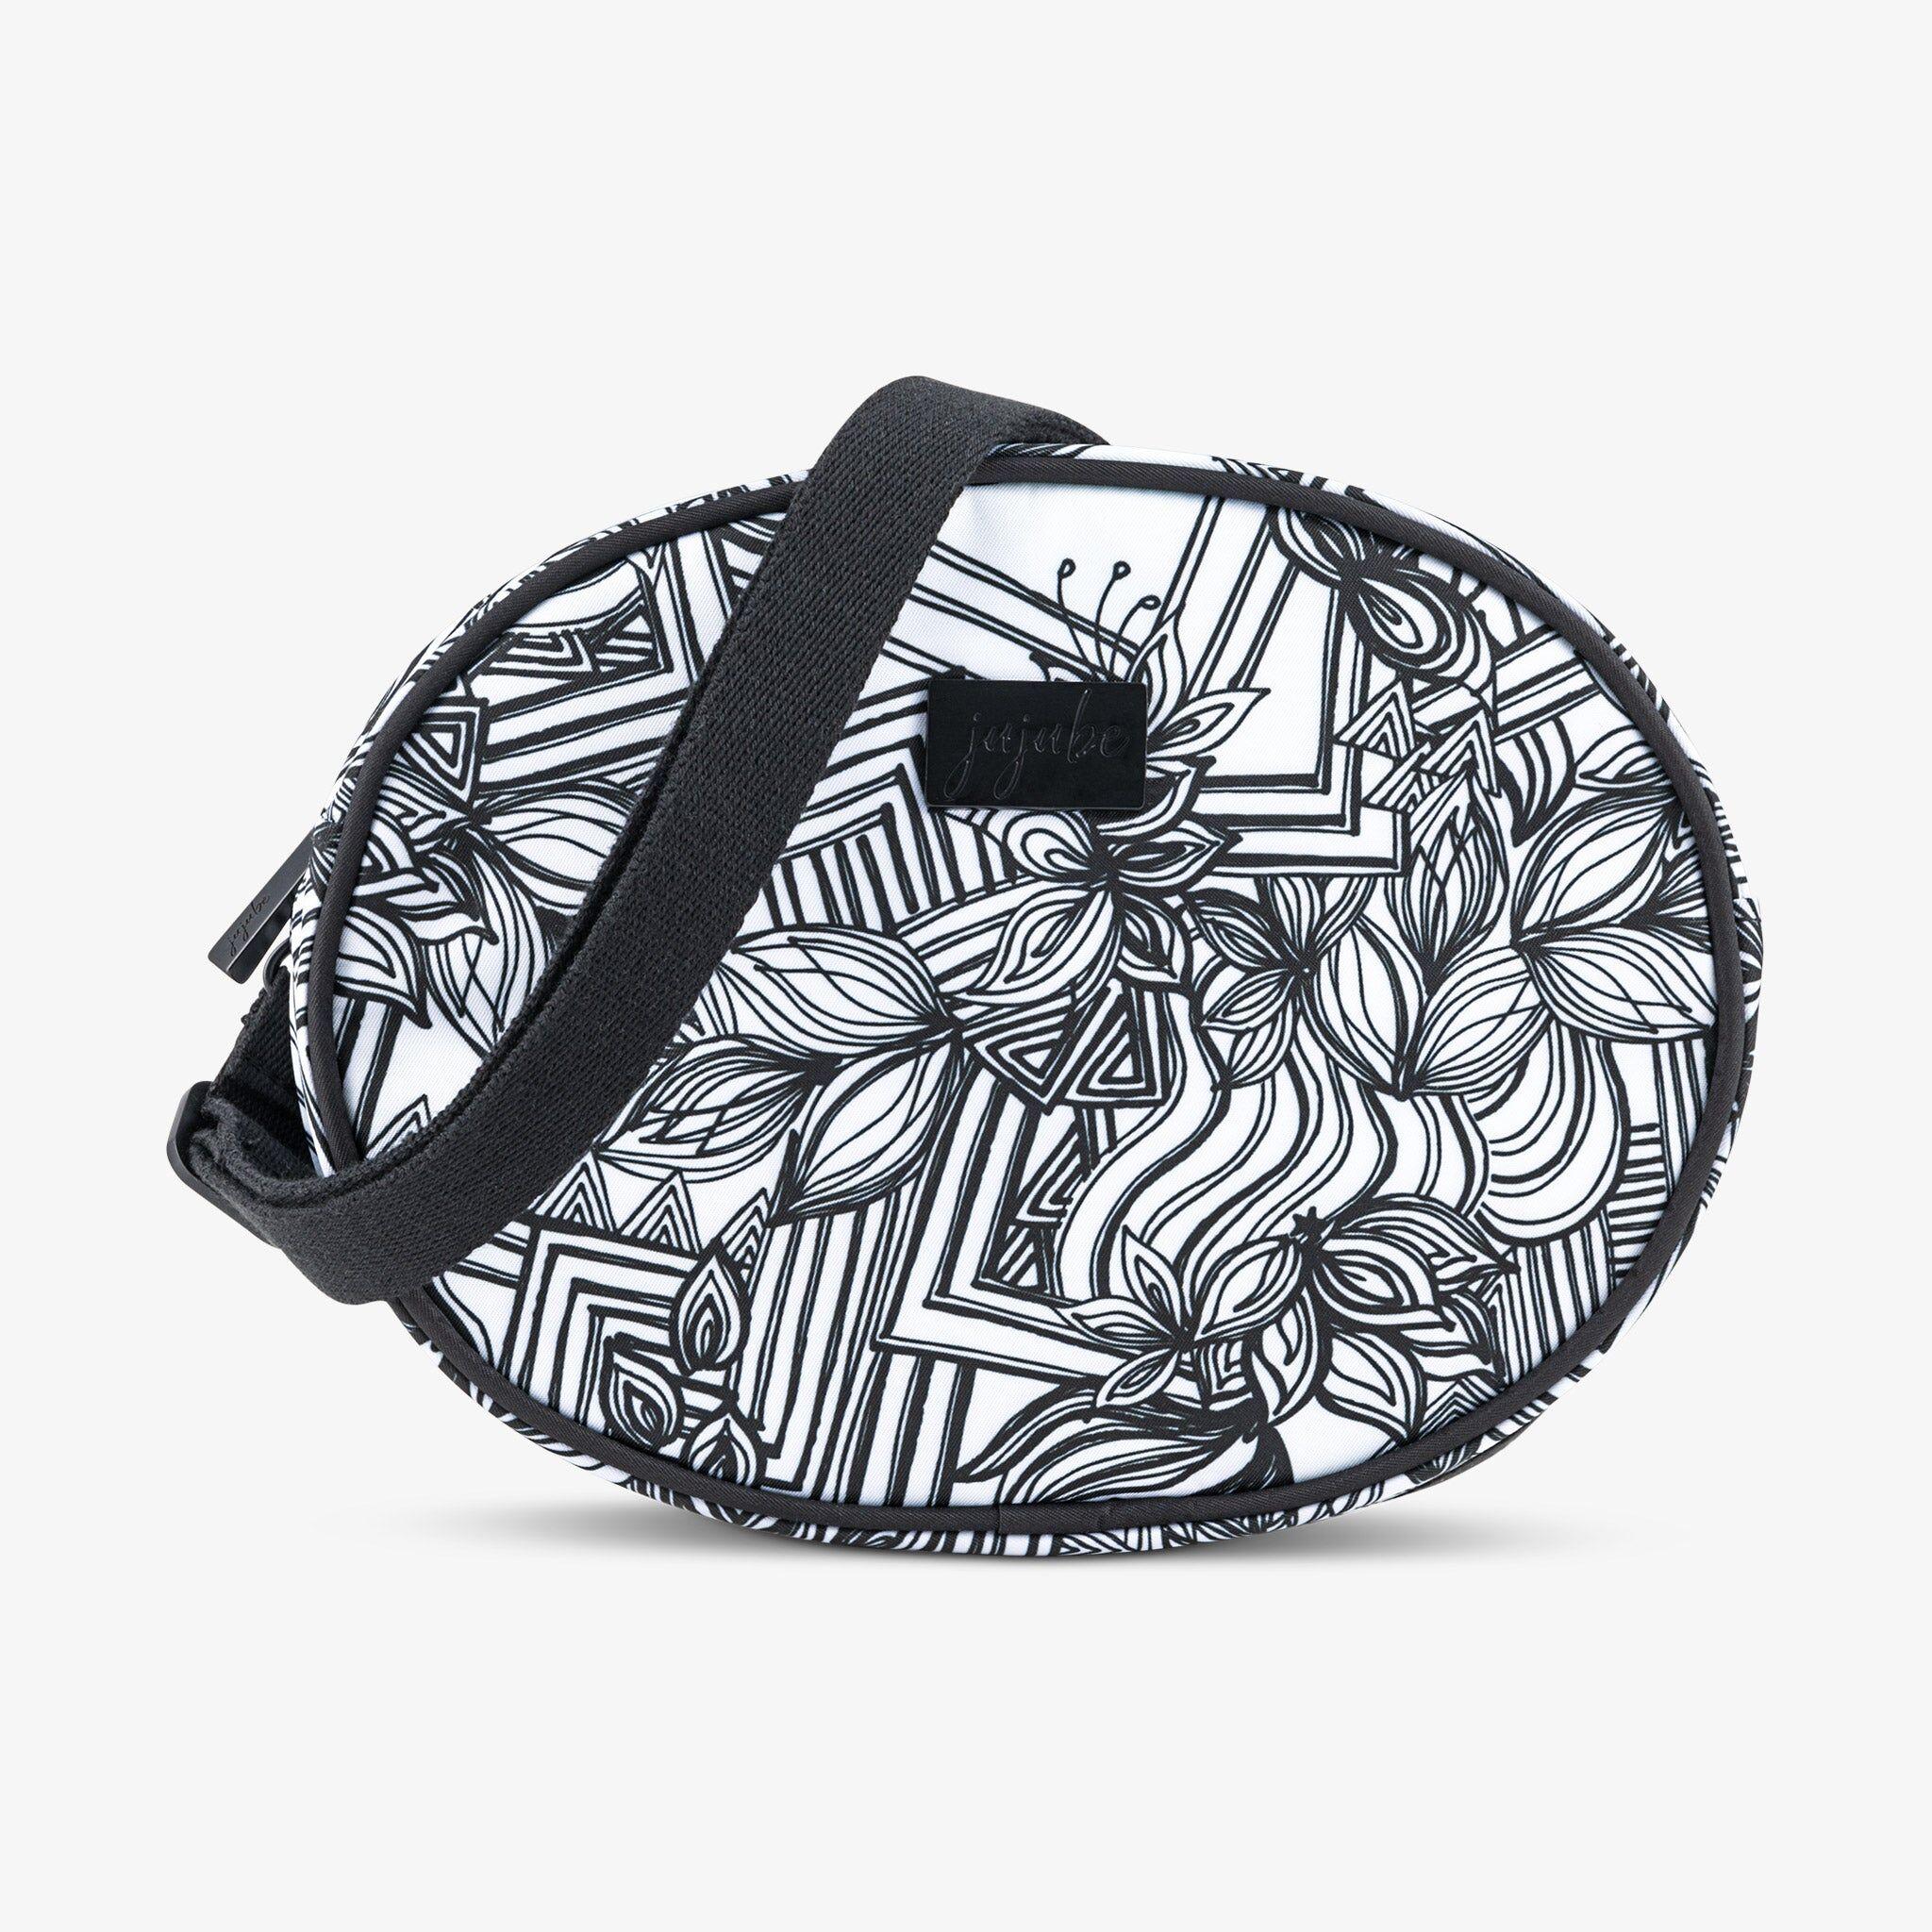 JuJuBe Freedom 2-in-1 Belt Bag - Sketch